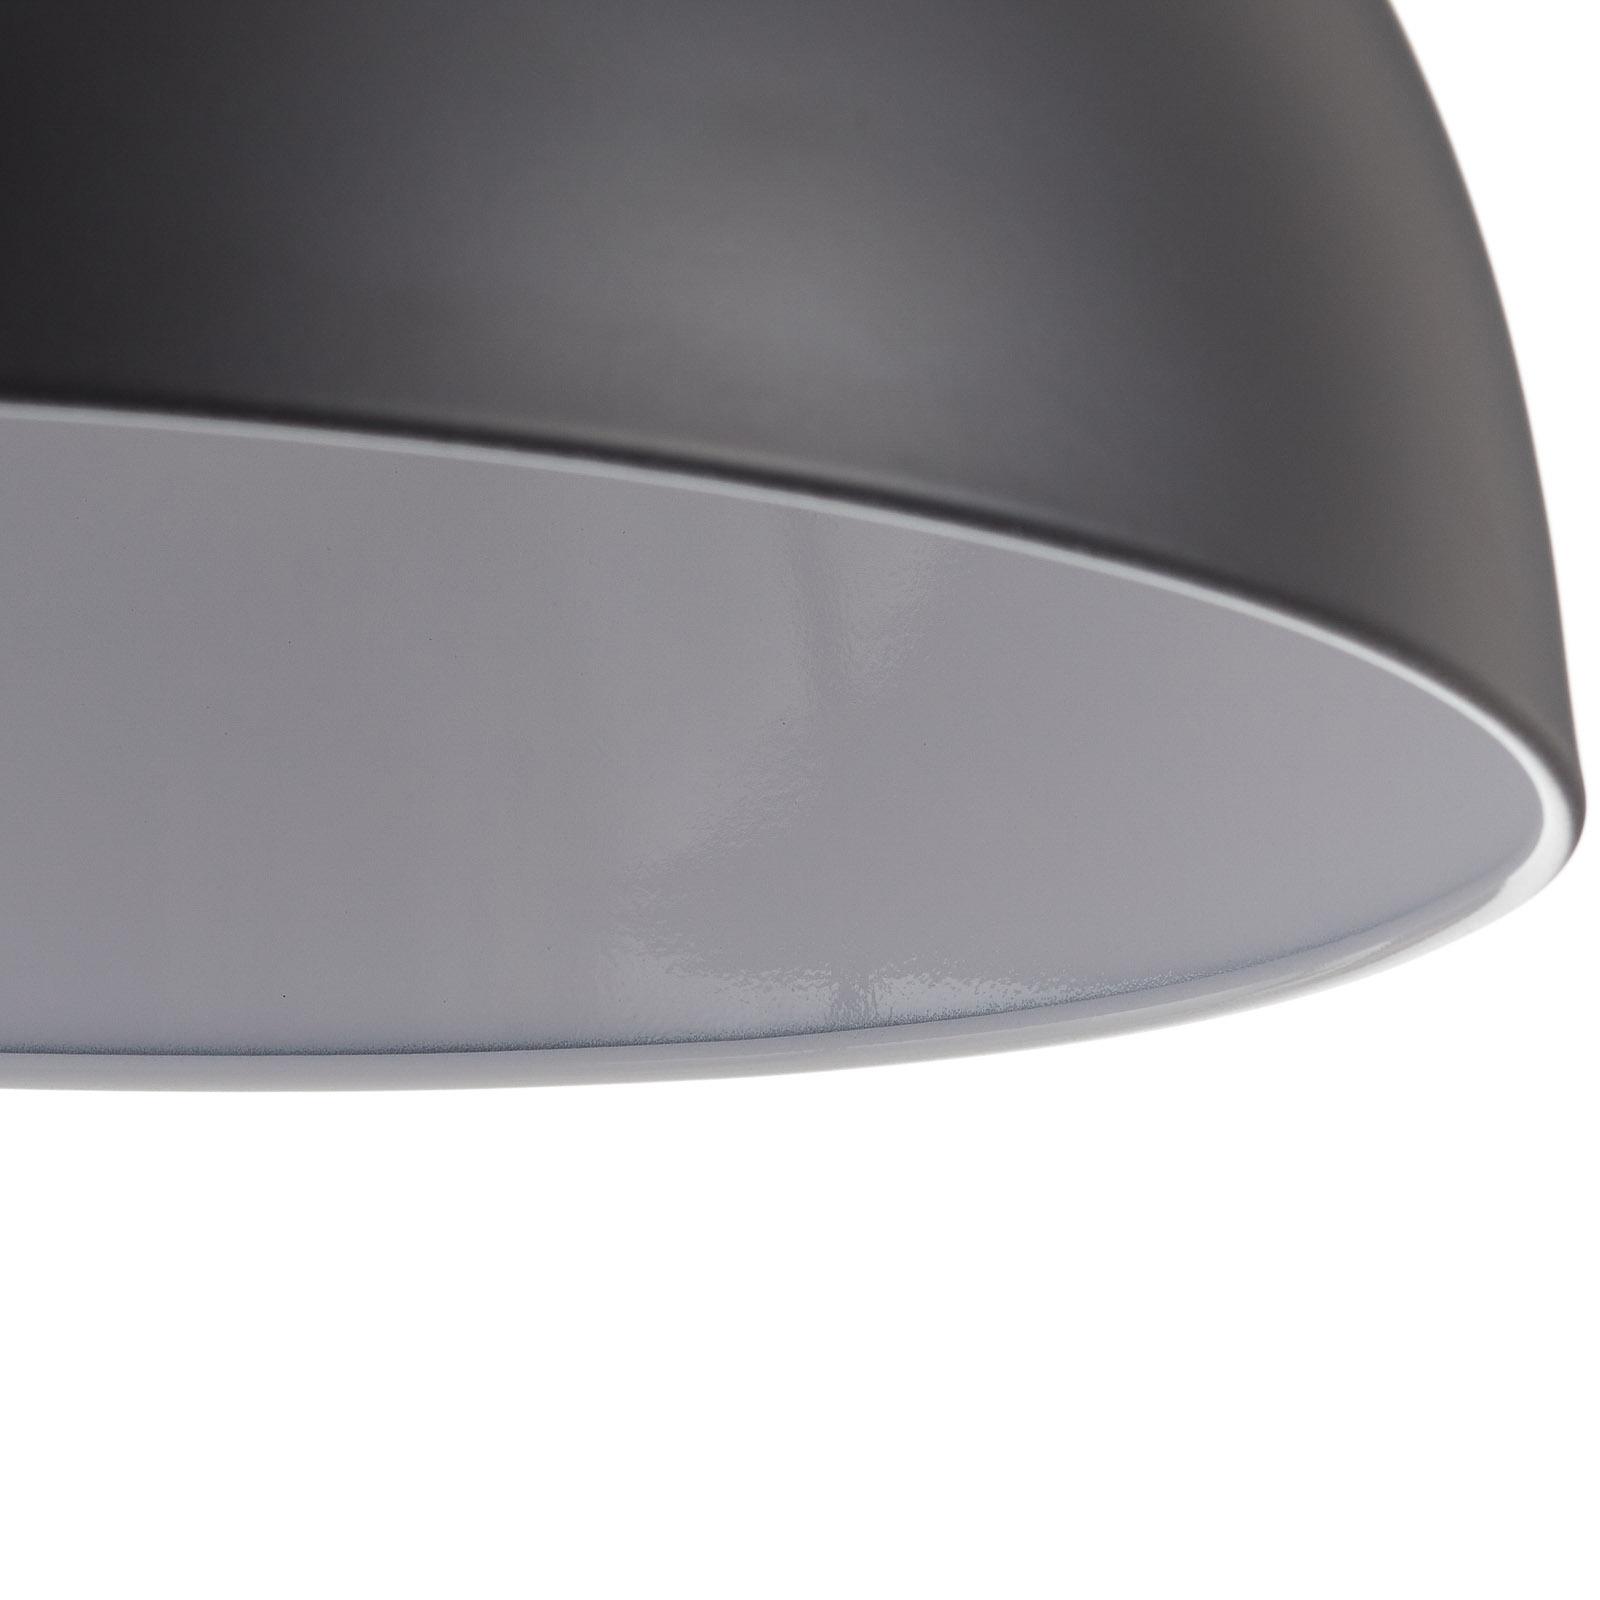 Schöner Wohnen Kia lampa wisząca czarna